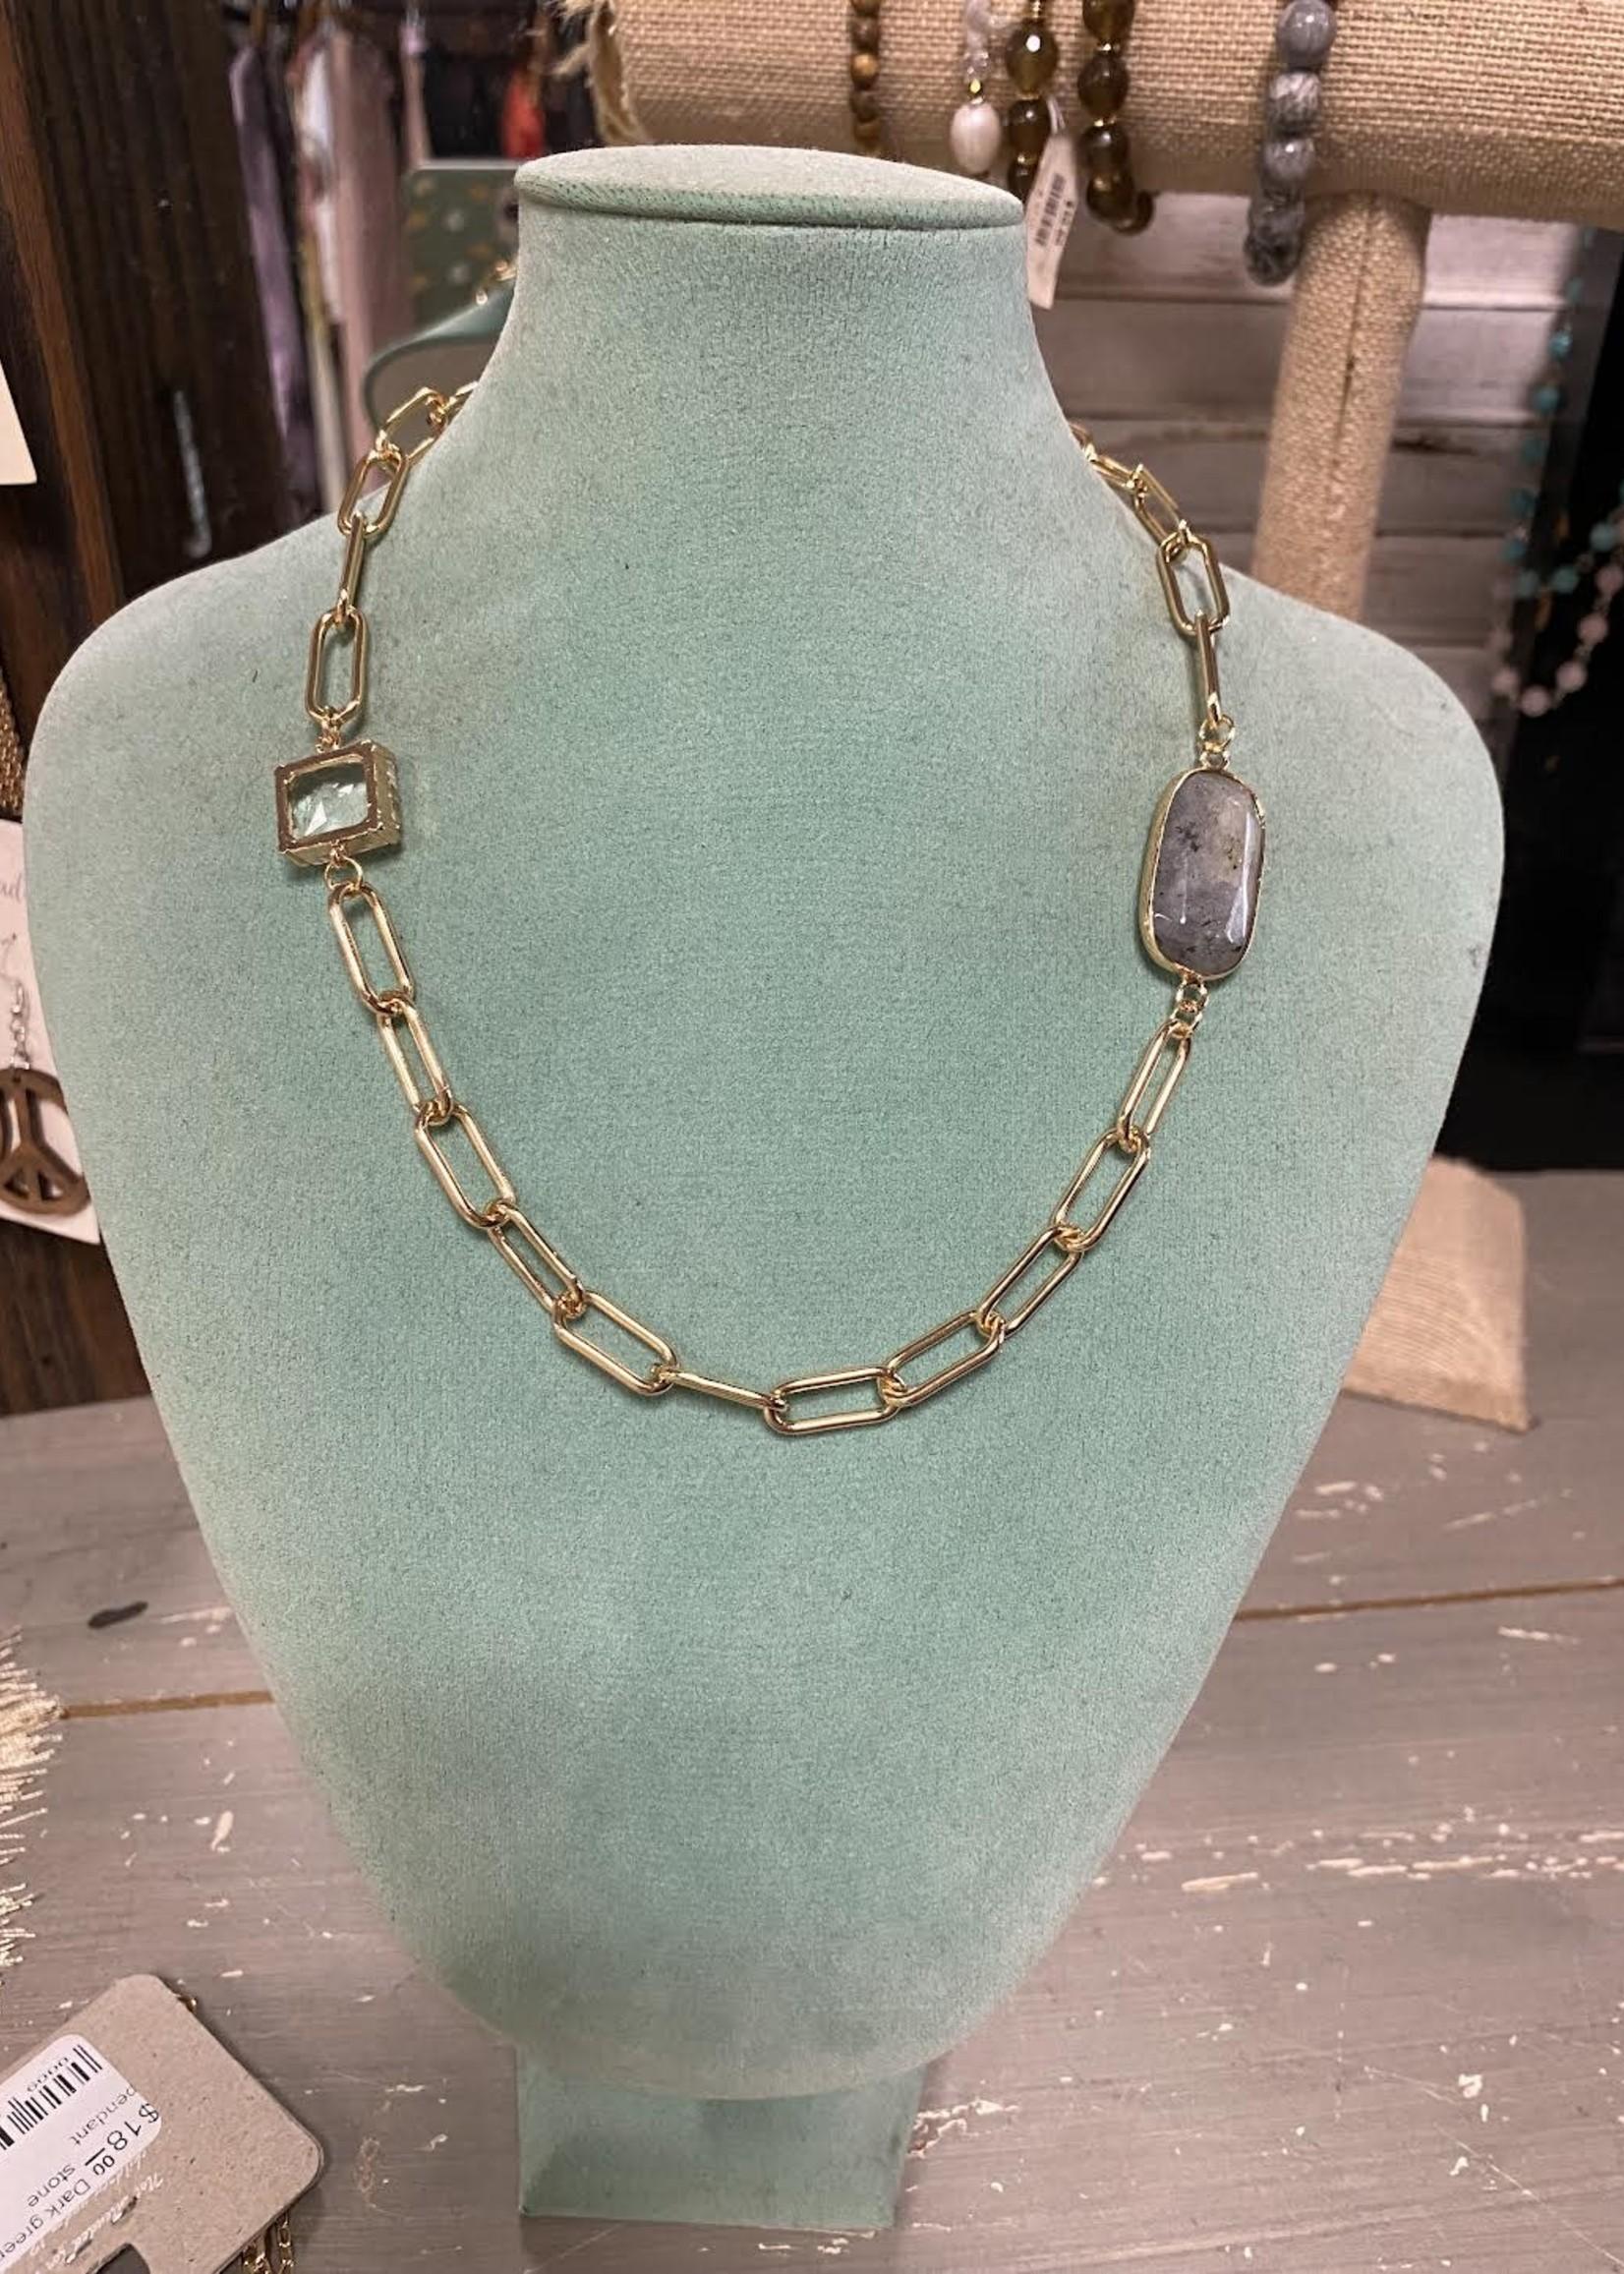 Gray stone pendant chain